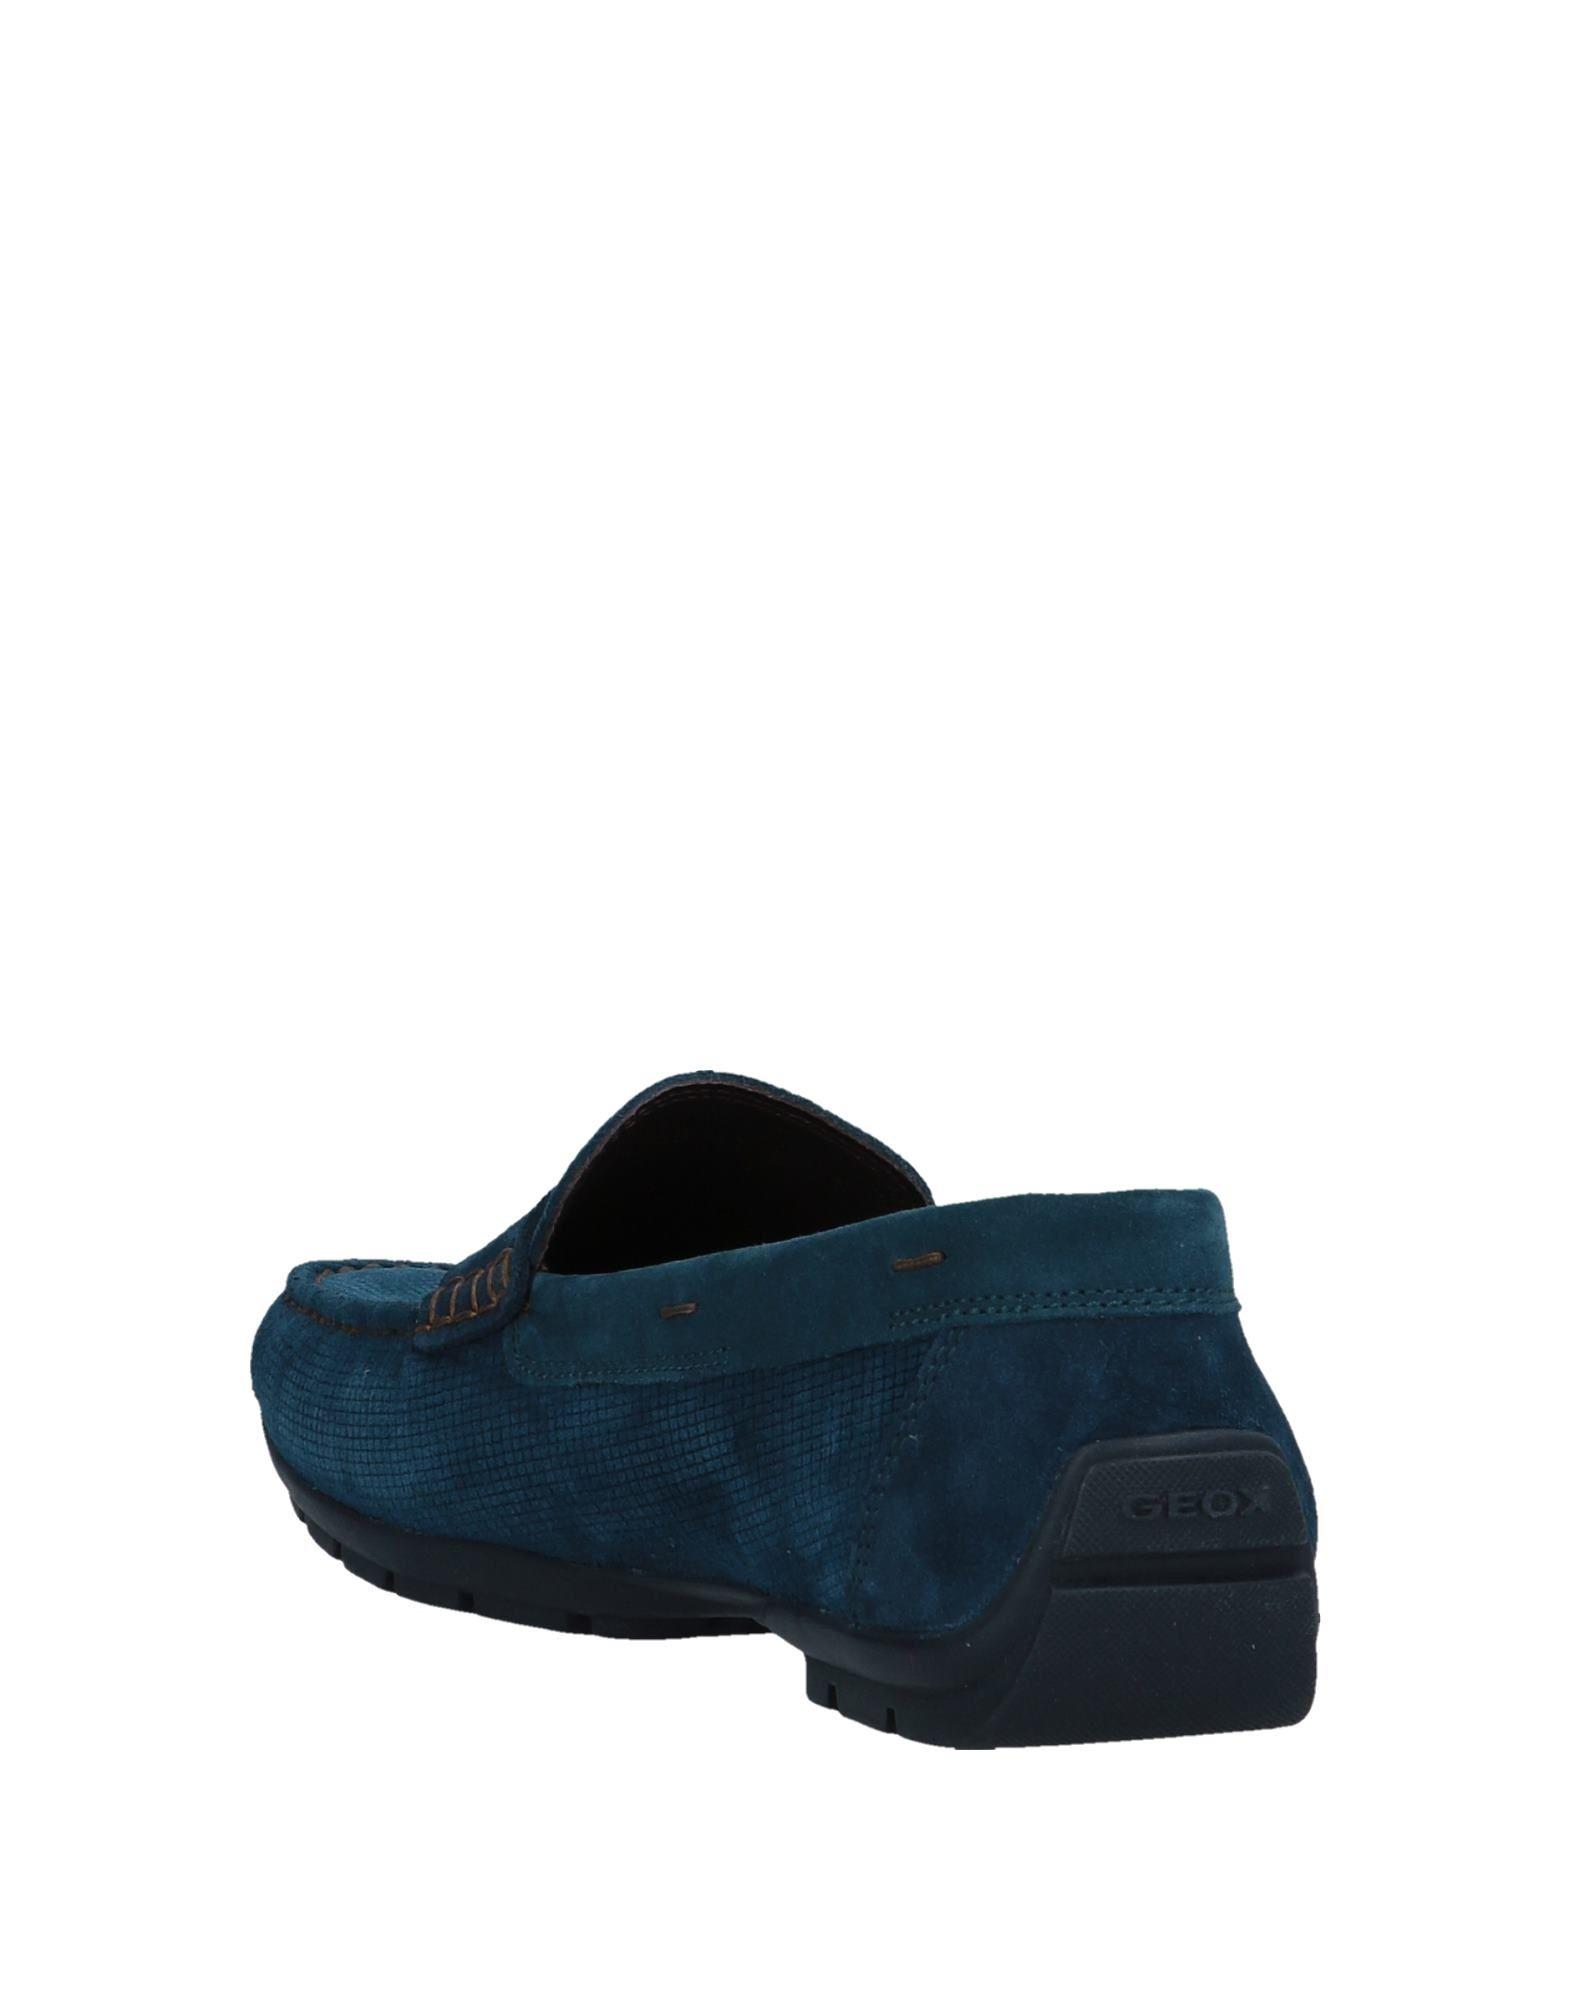 Geox  Mokassins Herren  Geox 11540899KK Heiße Schuhe c61fa3